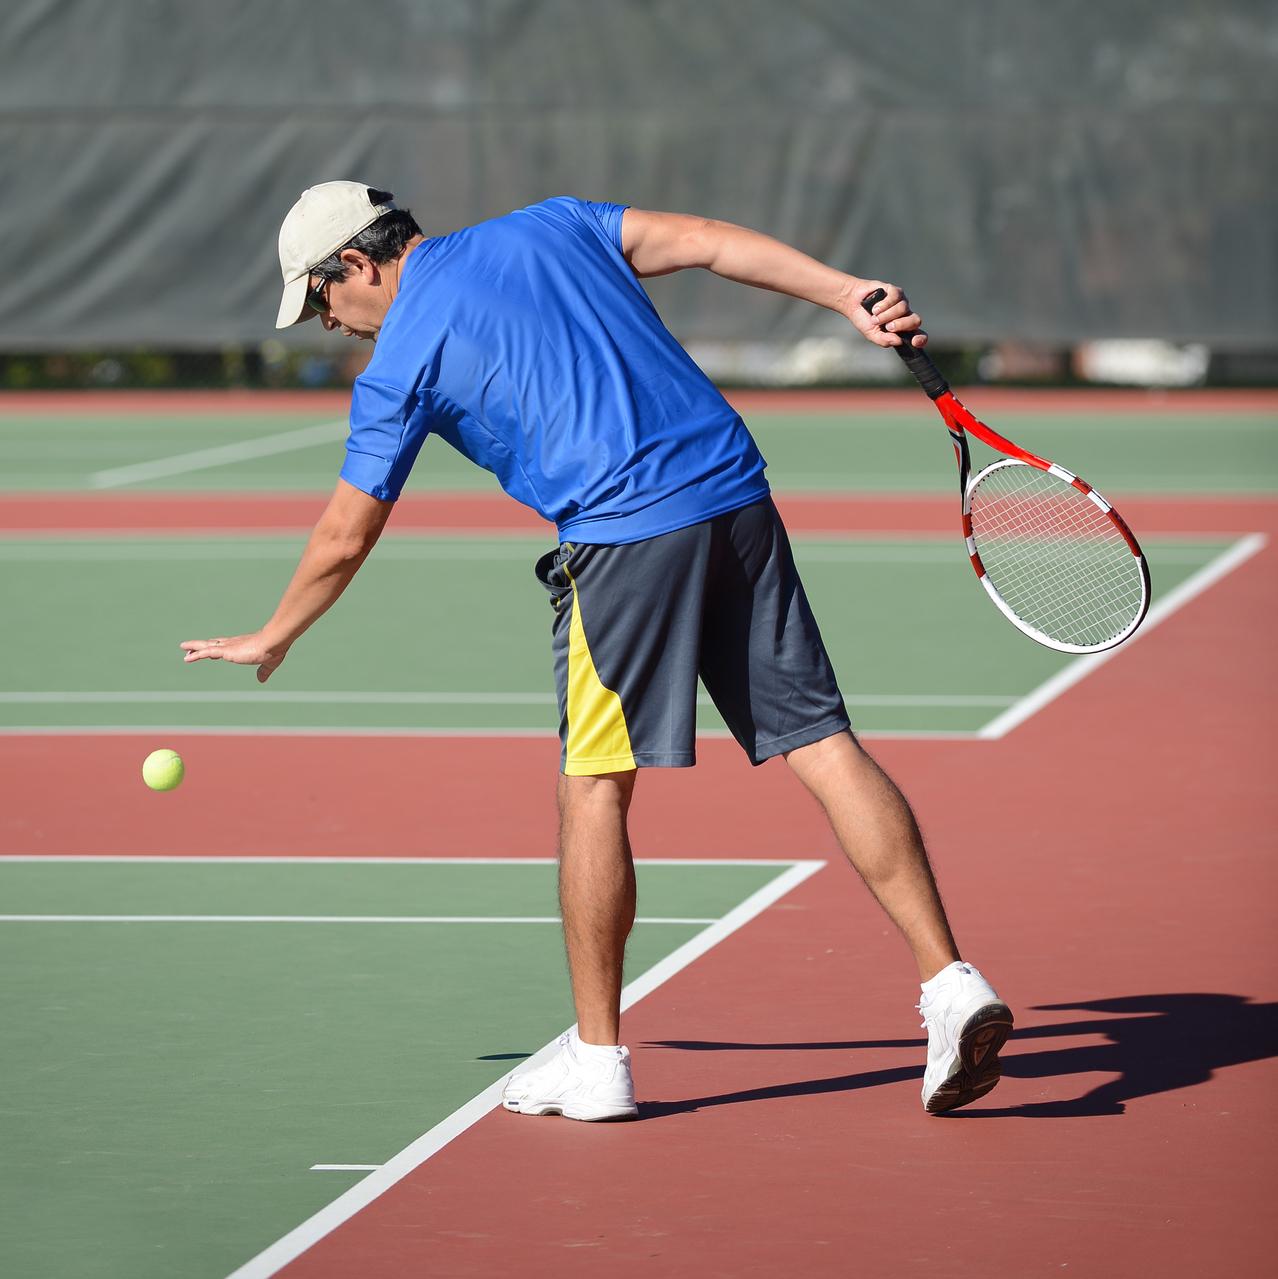 professional tennis lessons.jpg